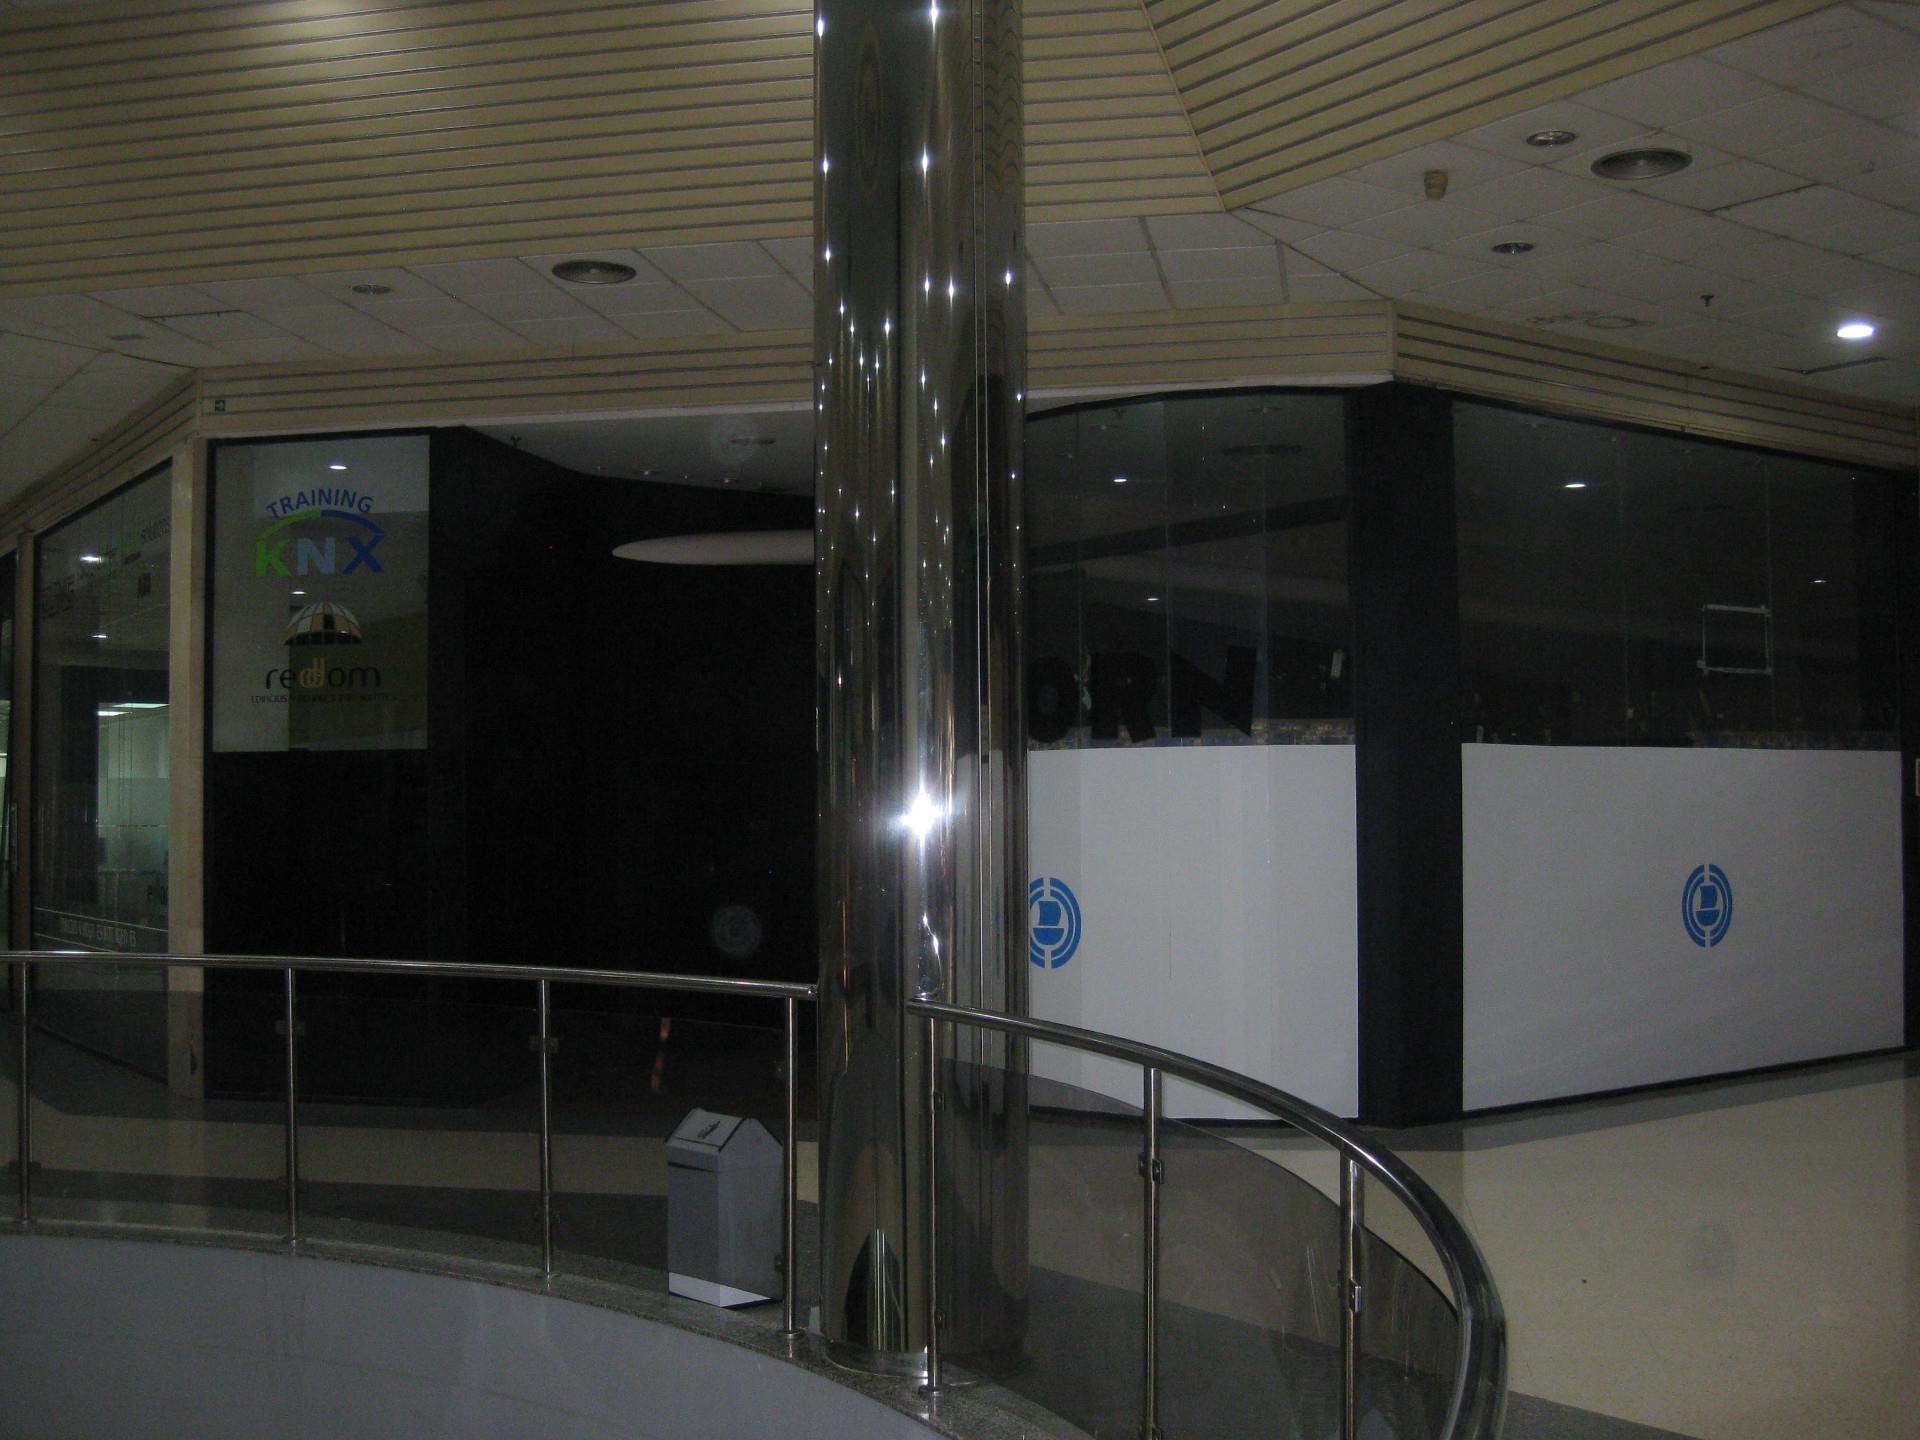 Oficina  Avenida al vedat. Zona avenida alta - auditorio / avenida al vedat